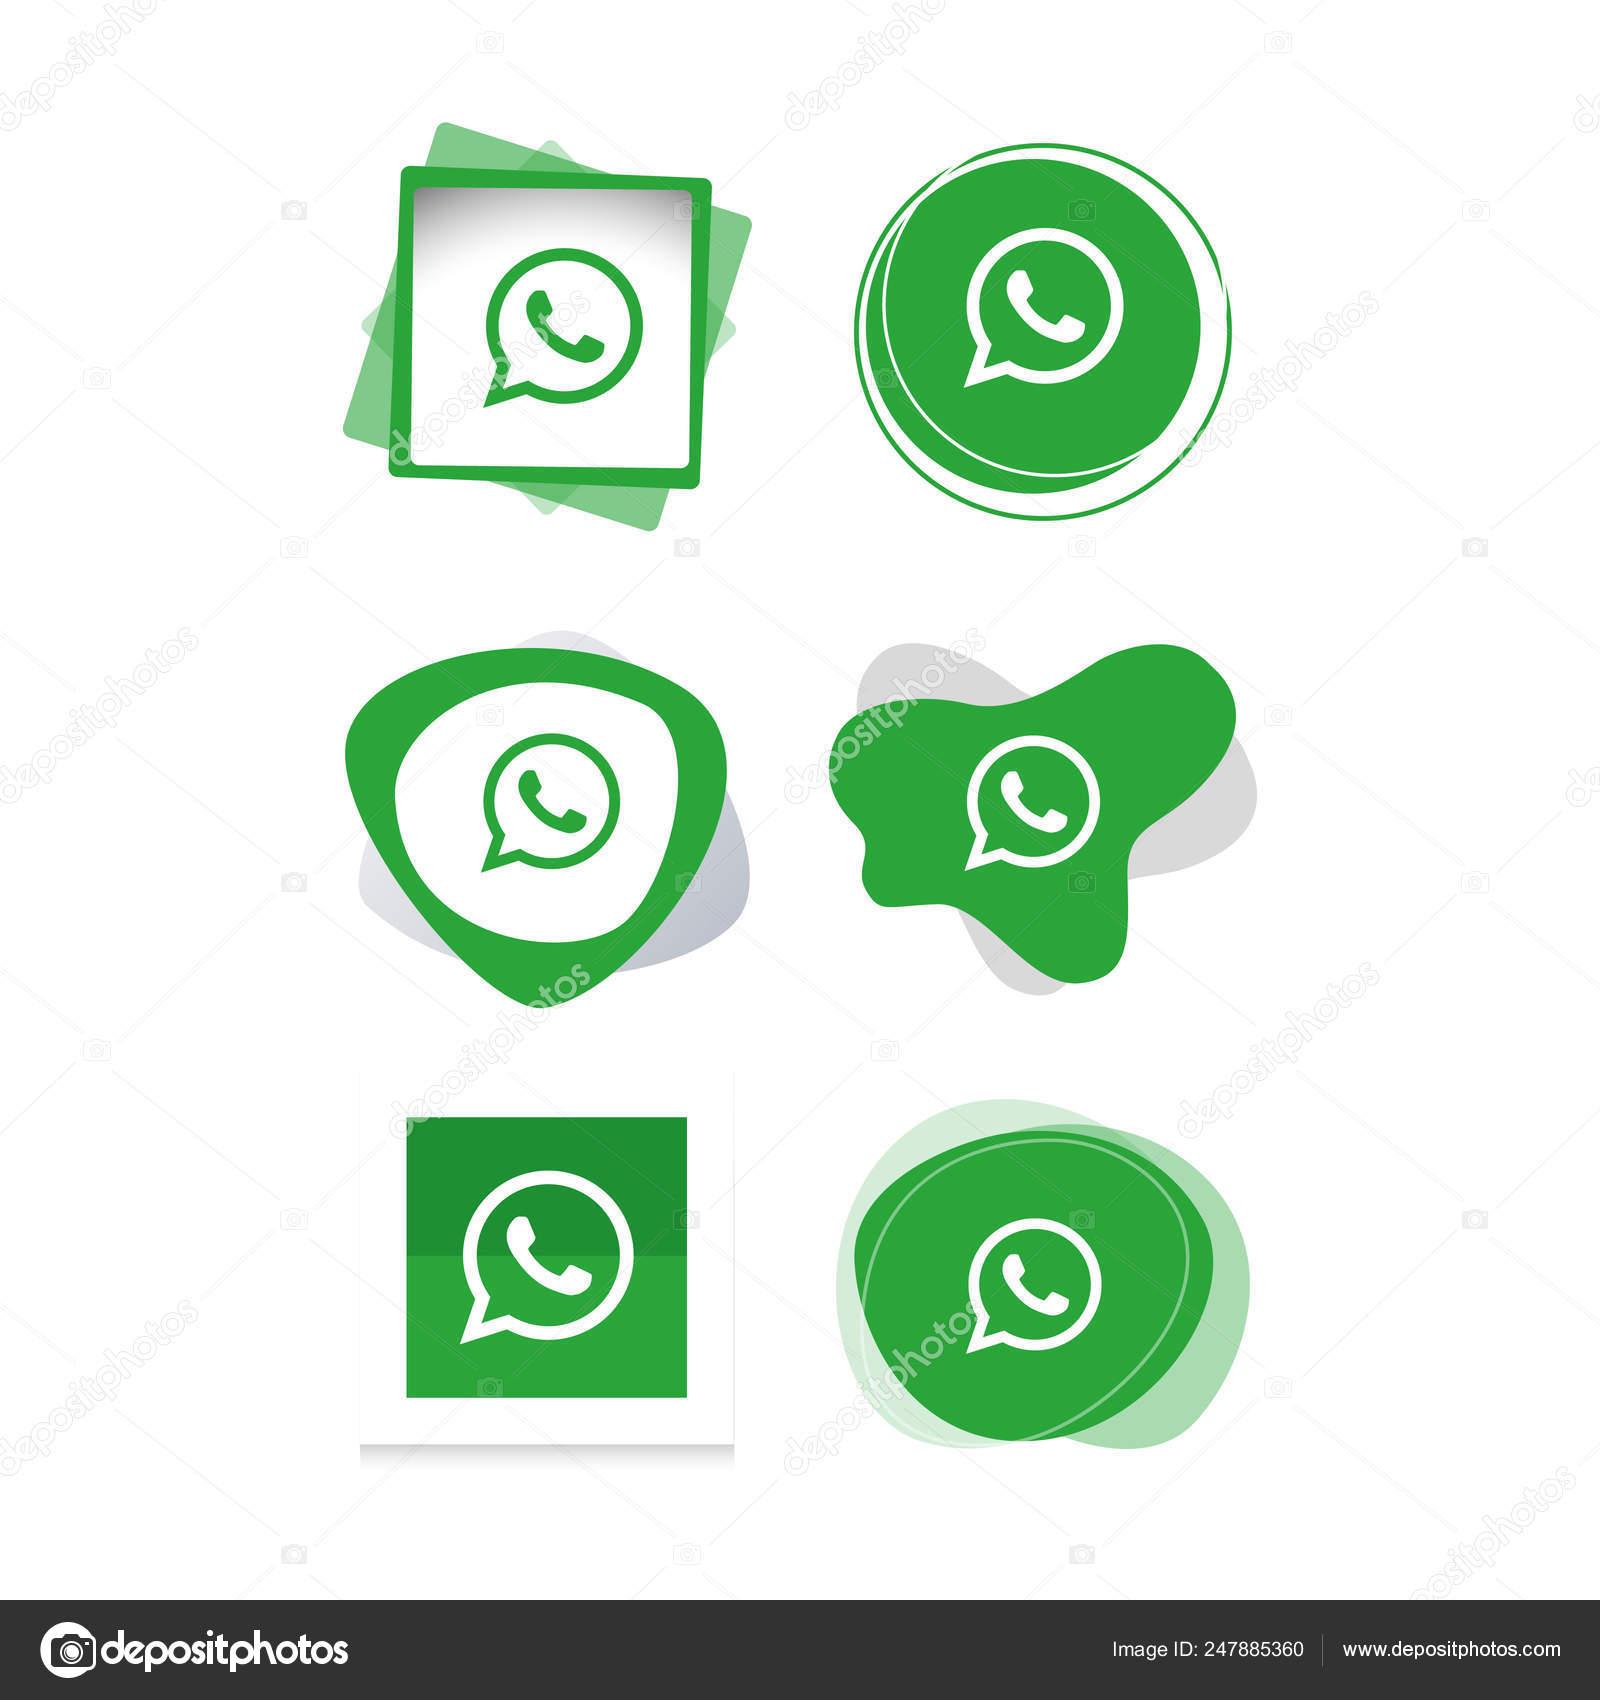 App whats WhatsApp